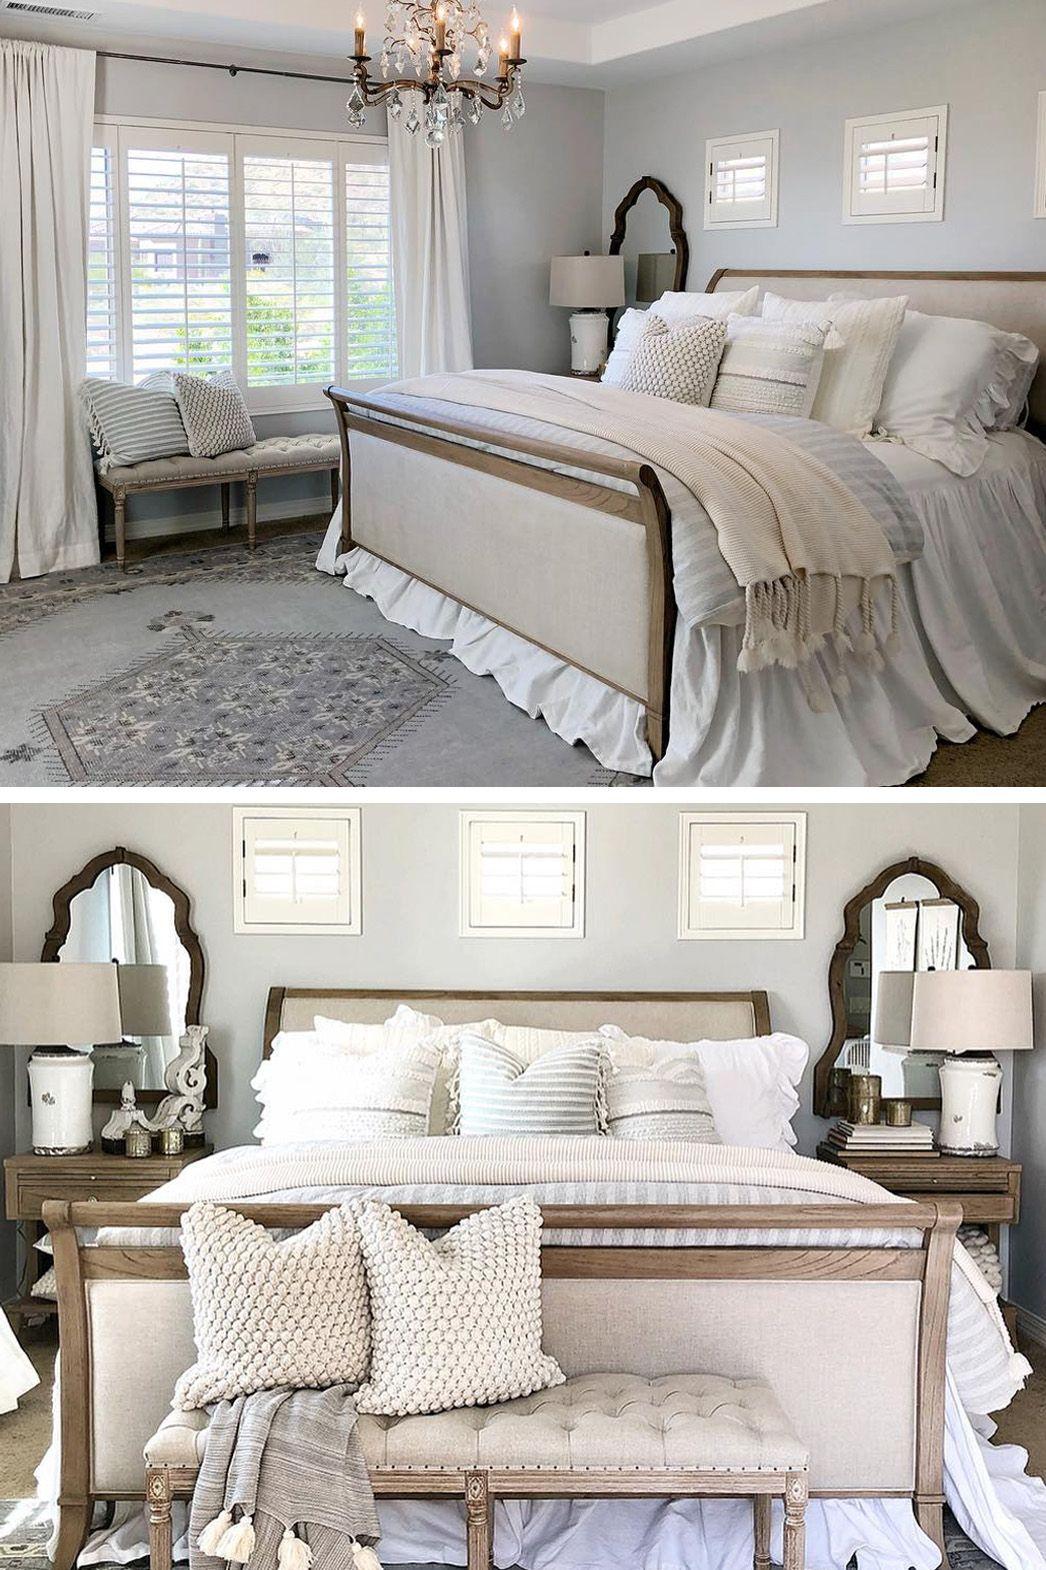 Pearson Bedroom Collection—Arhaus Classic bedroom decor